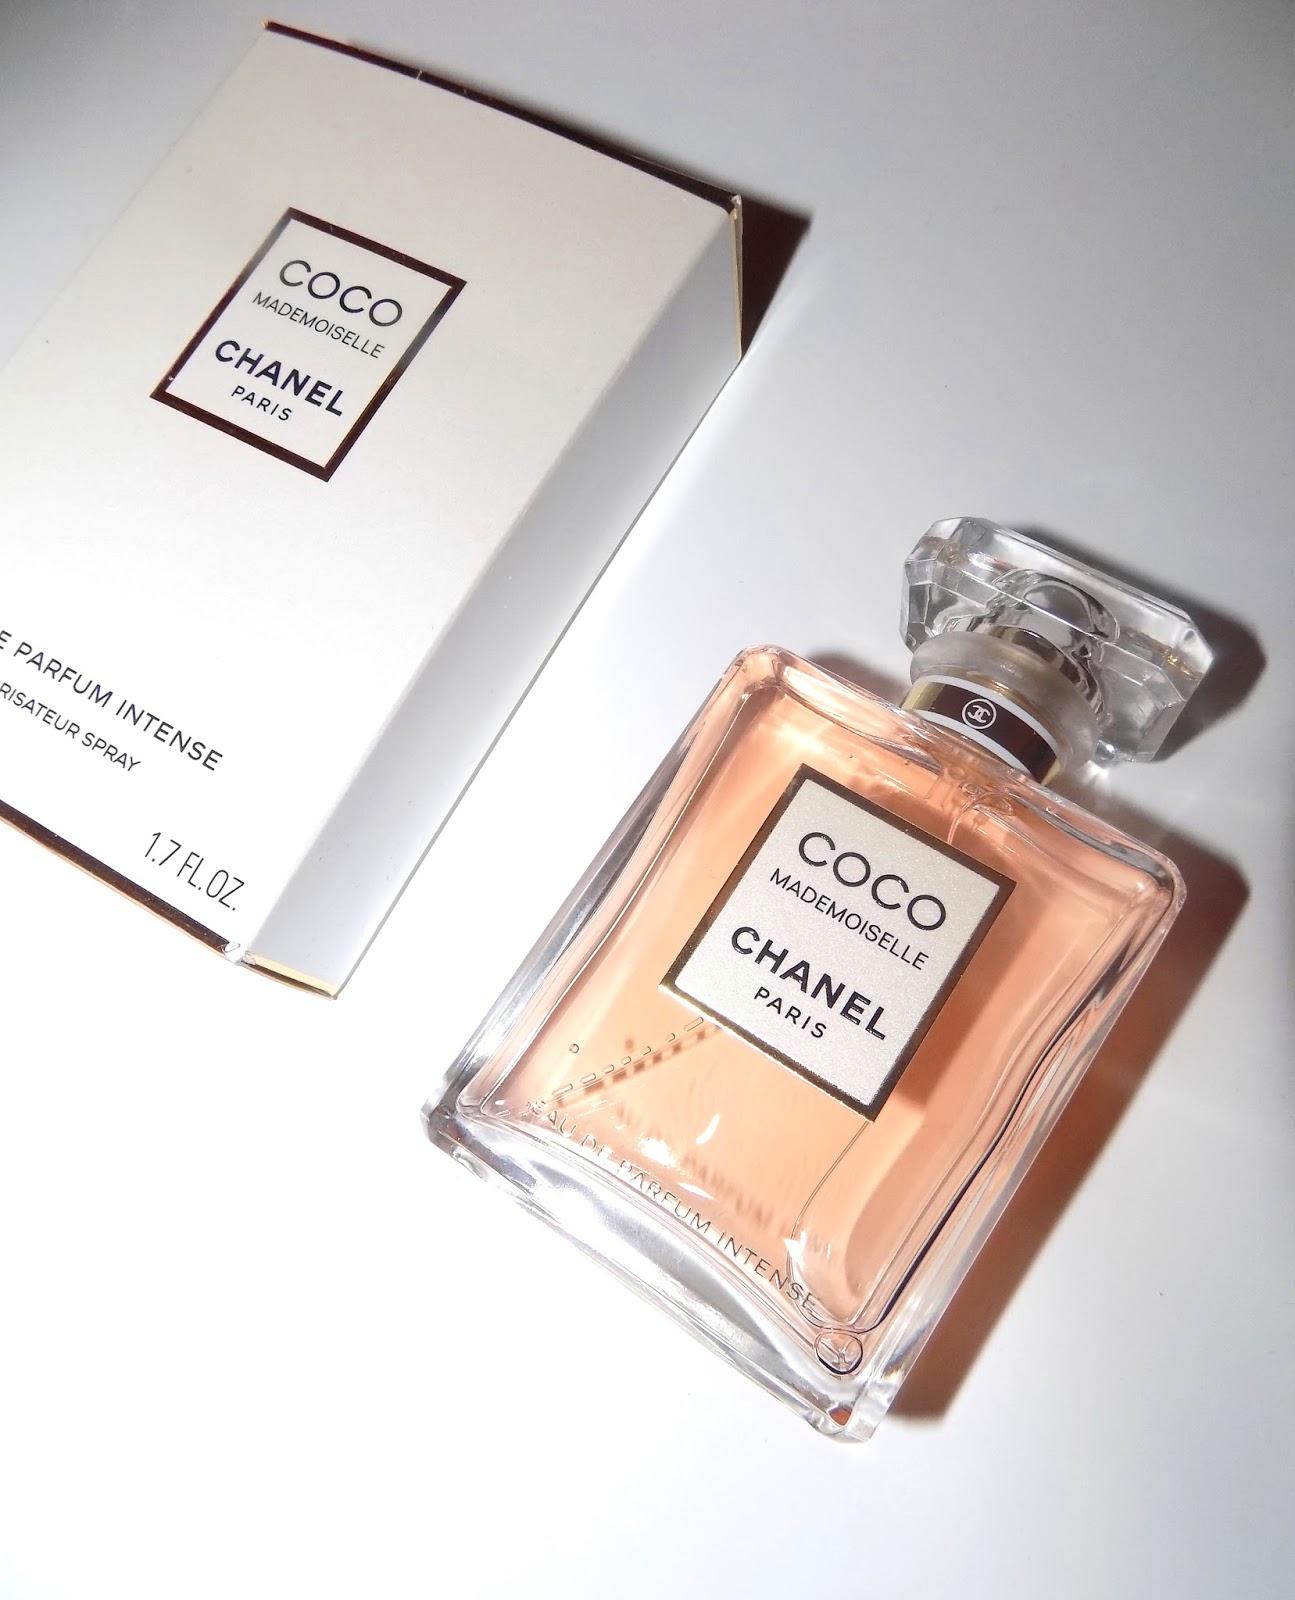 The Beauty Alchemist Chanel Coco Mademoiselle Intense